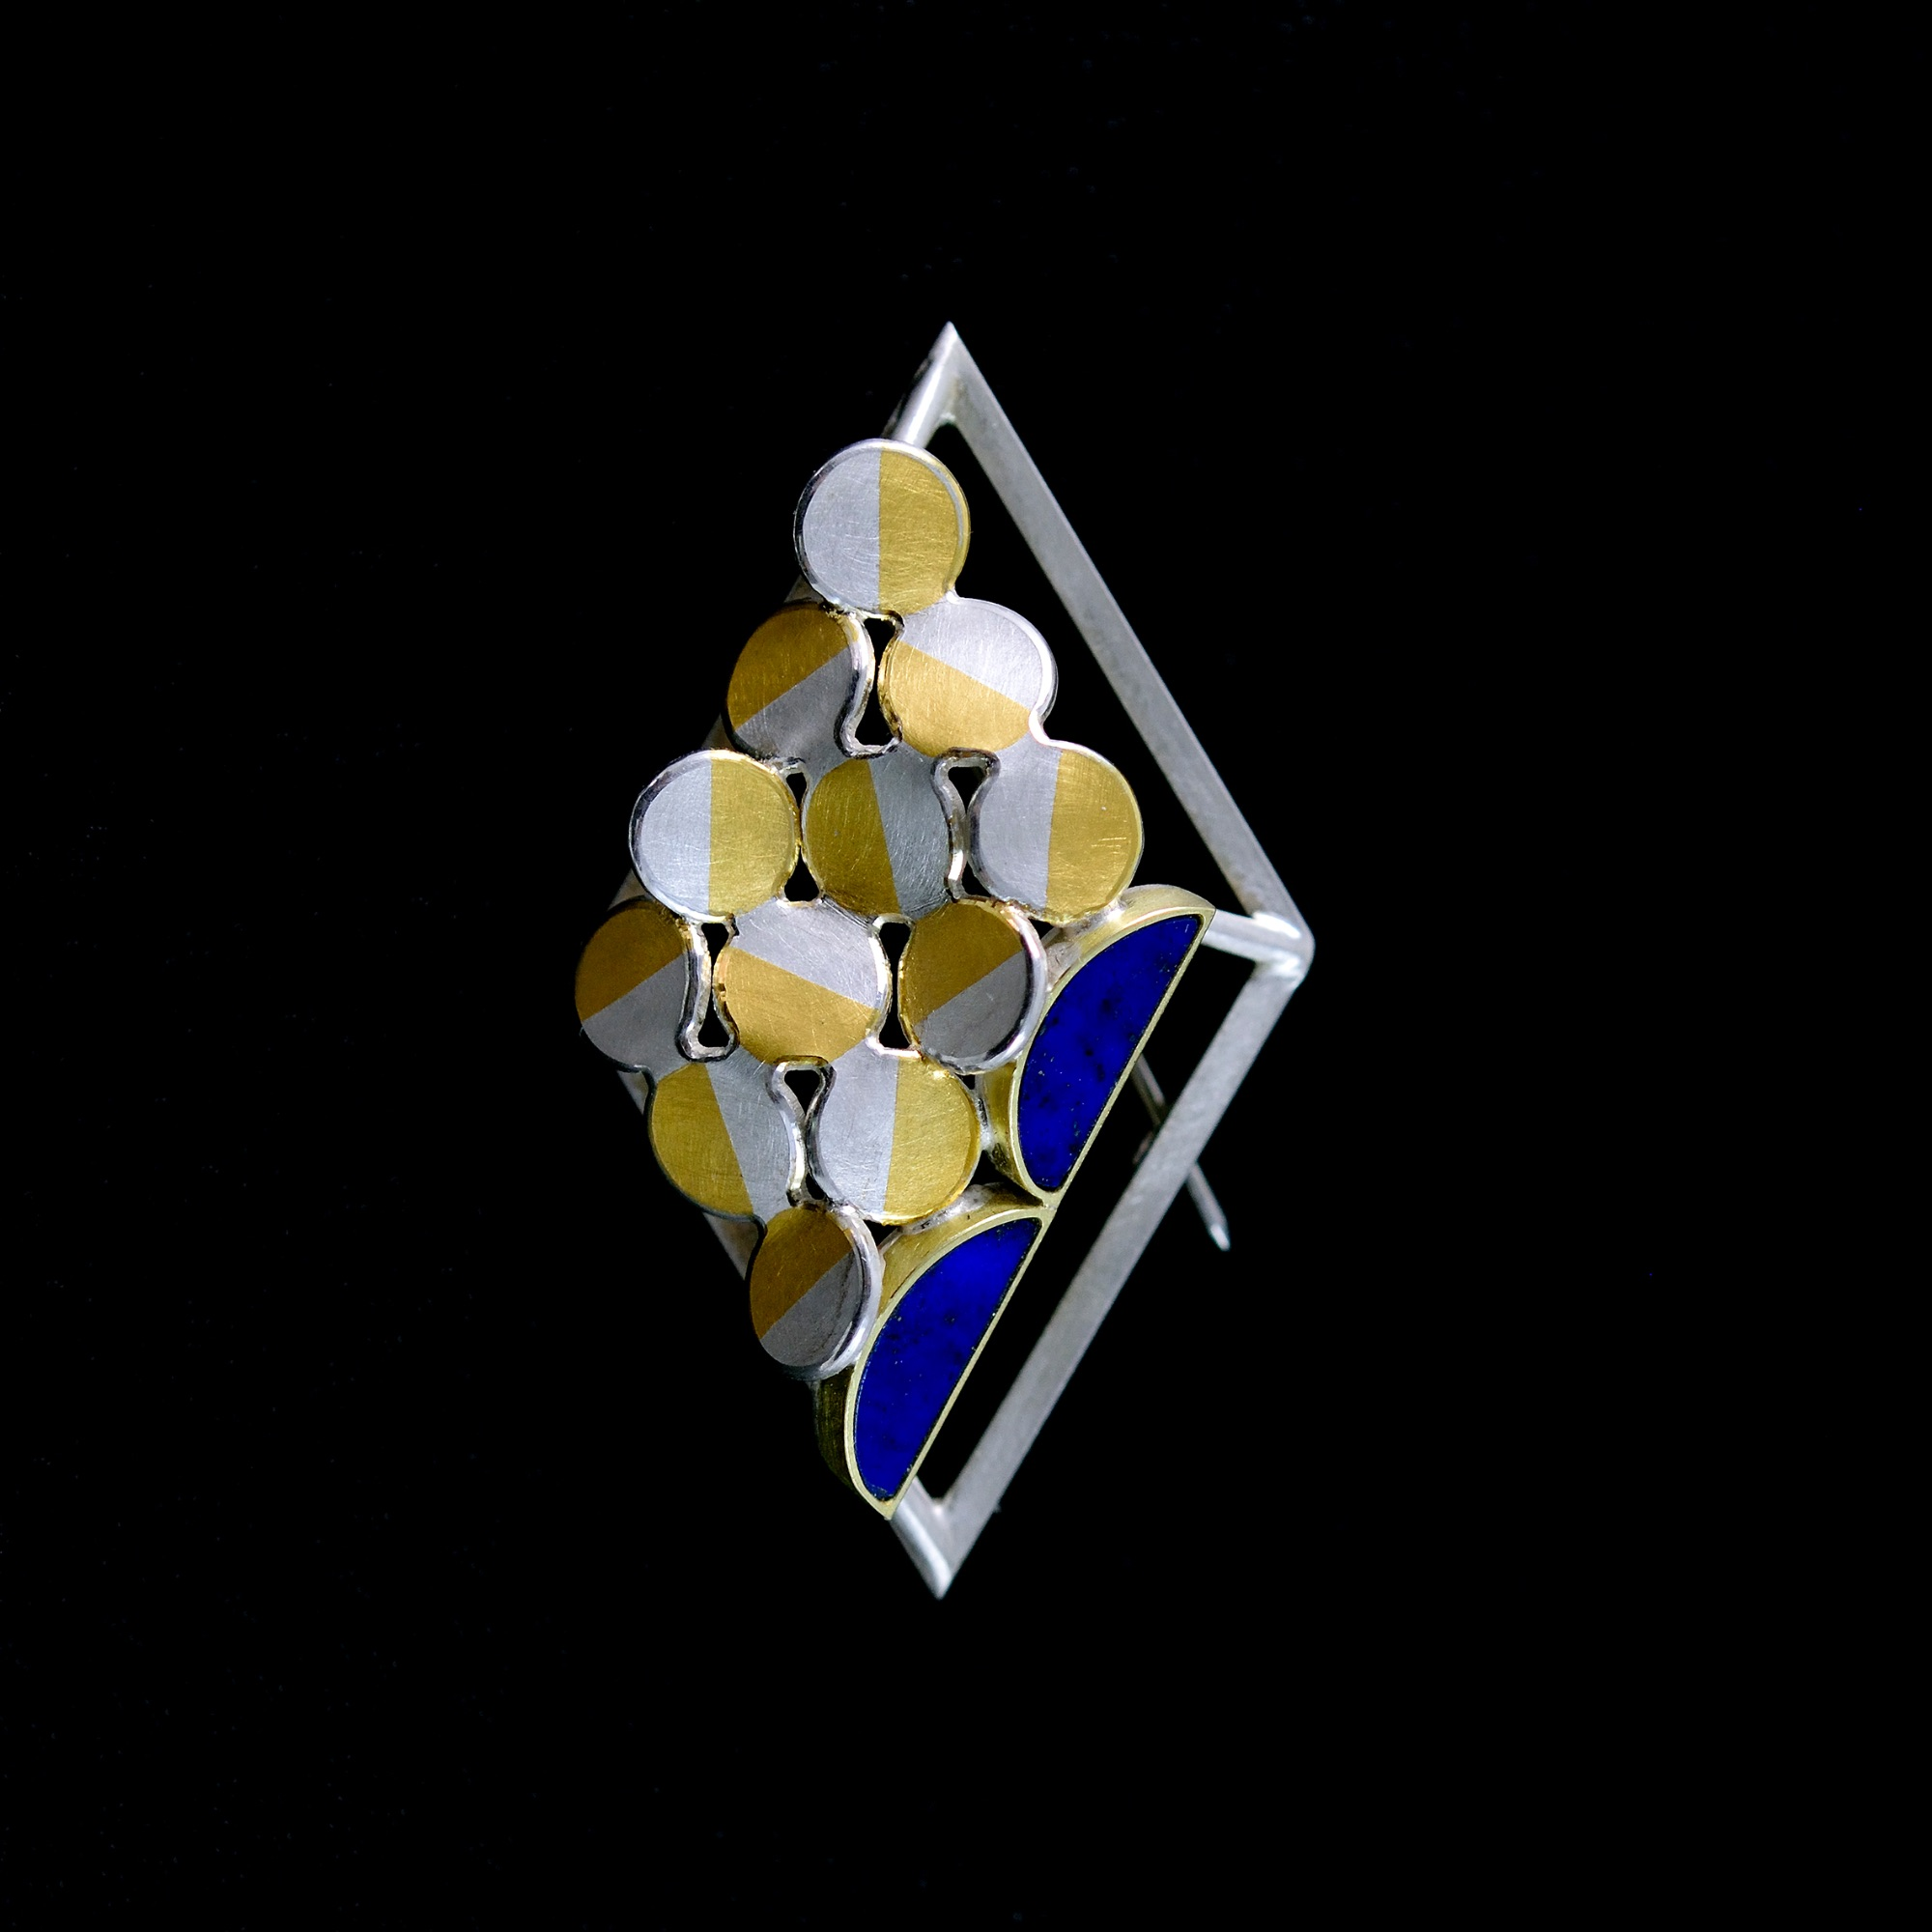 Rhombus lapis brooch